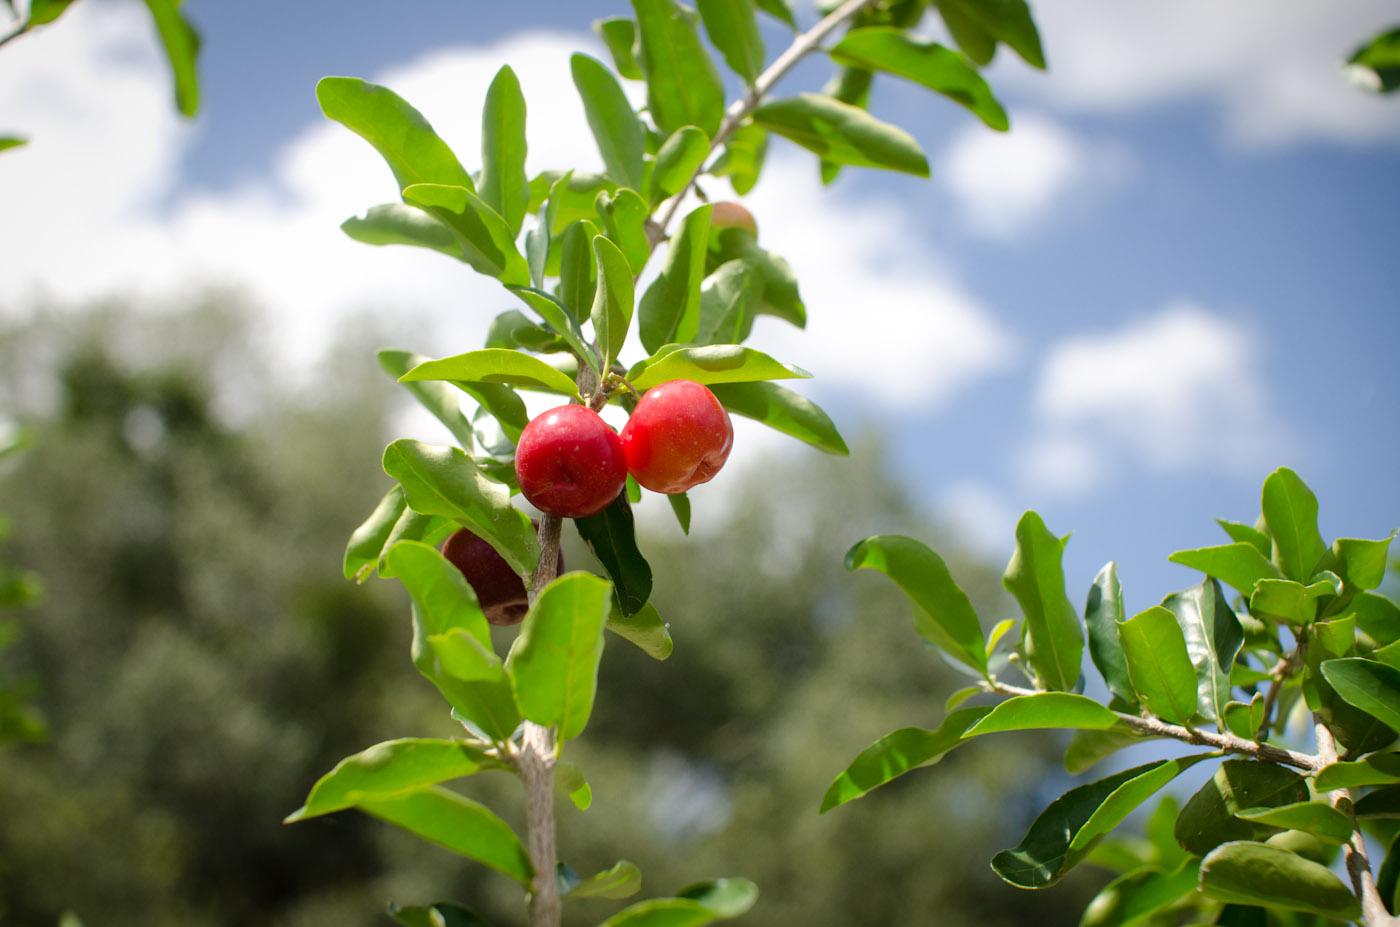 barbados cherry fruit-6047.jpg